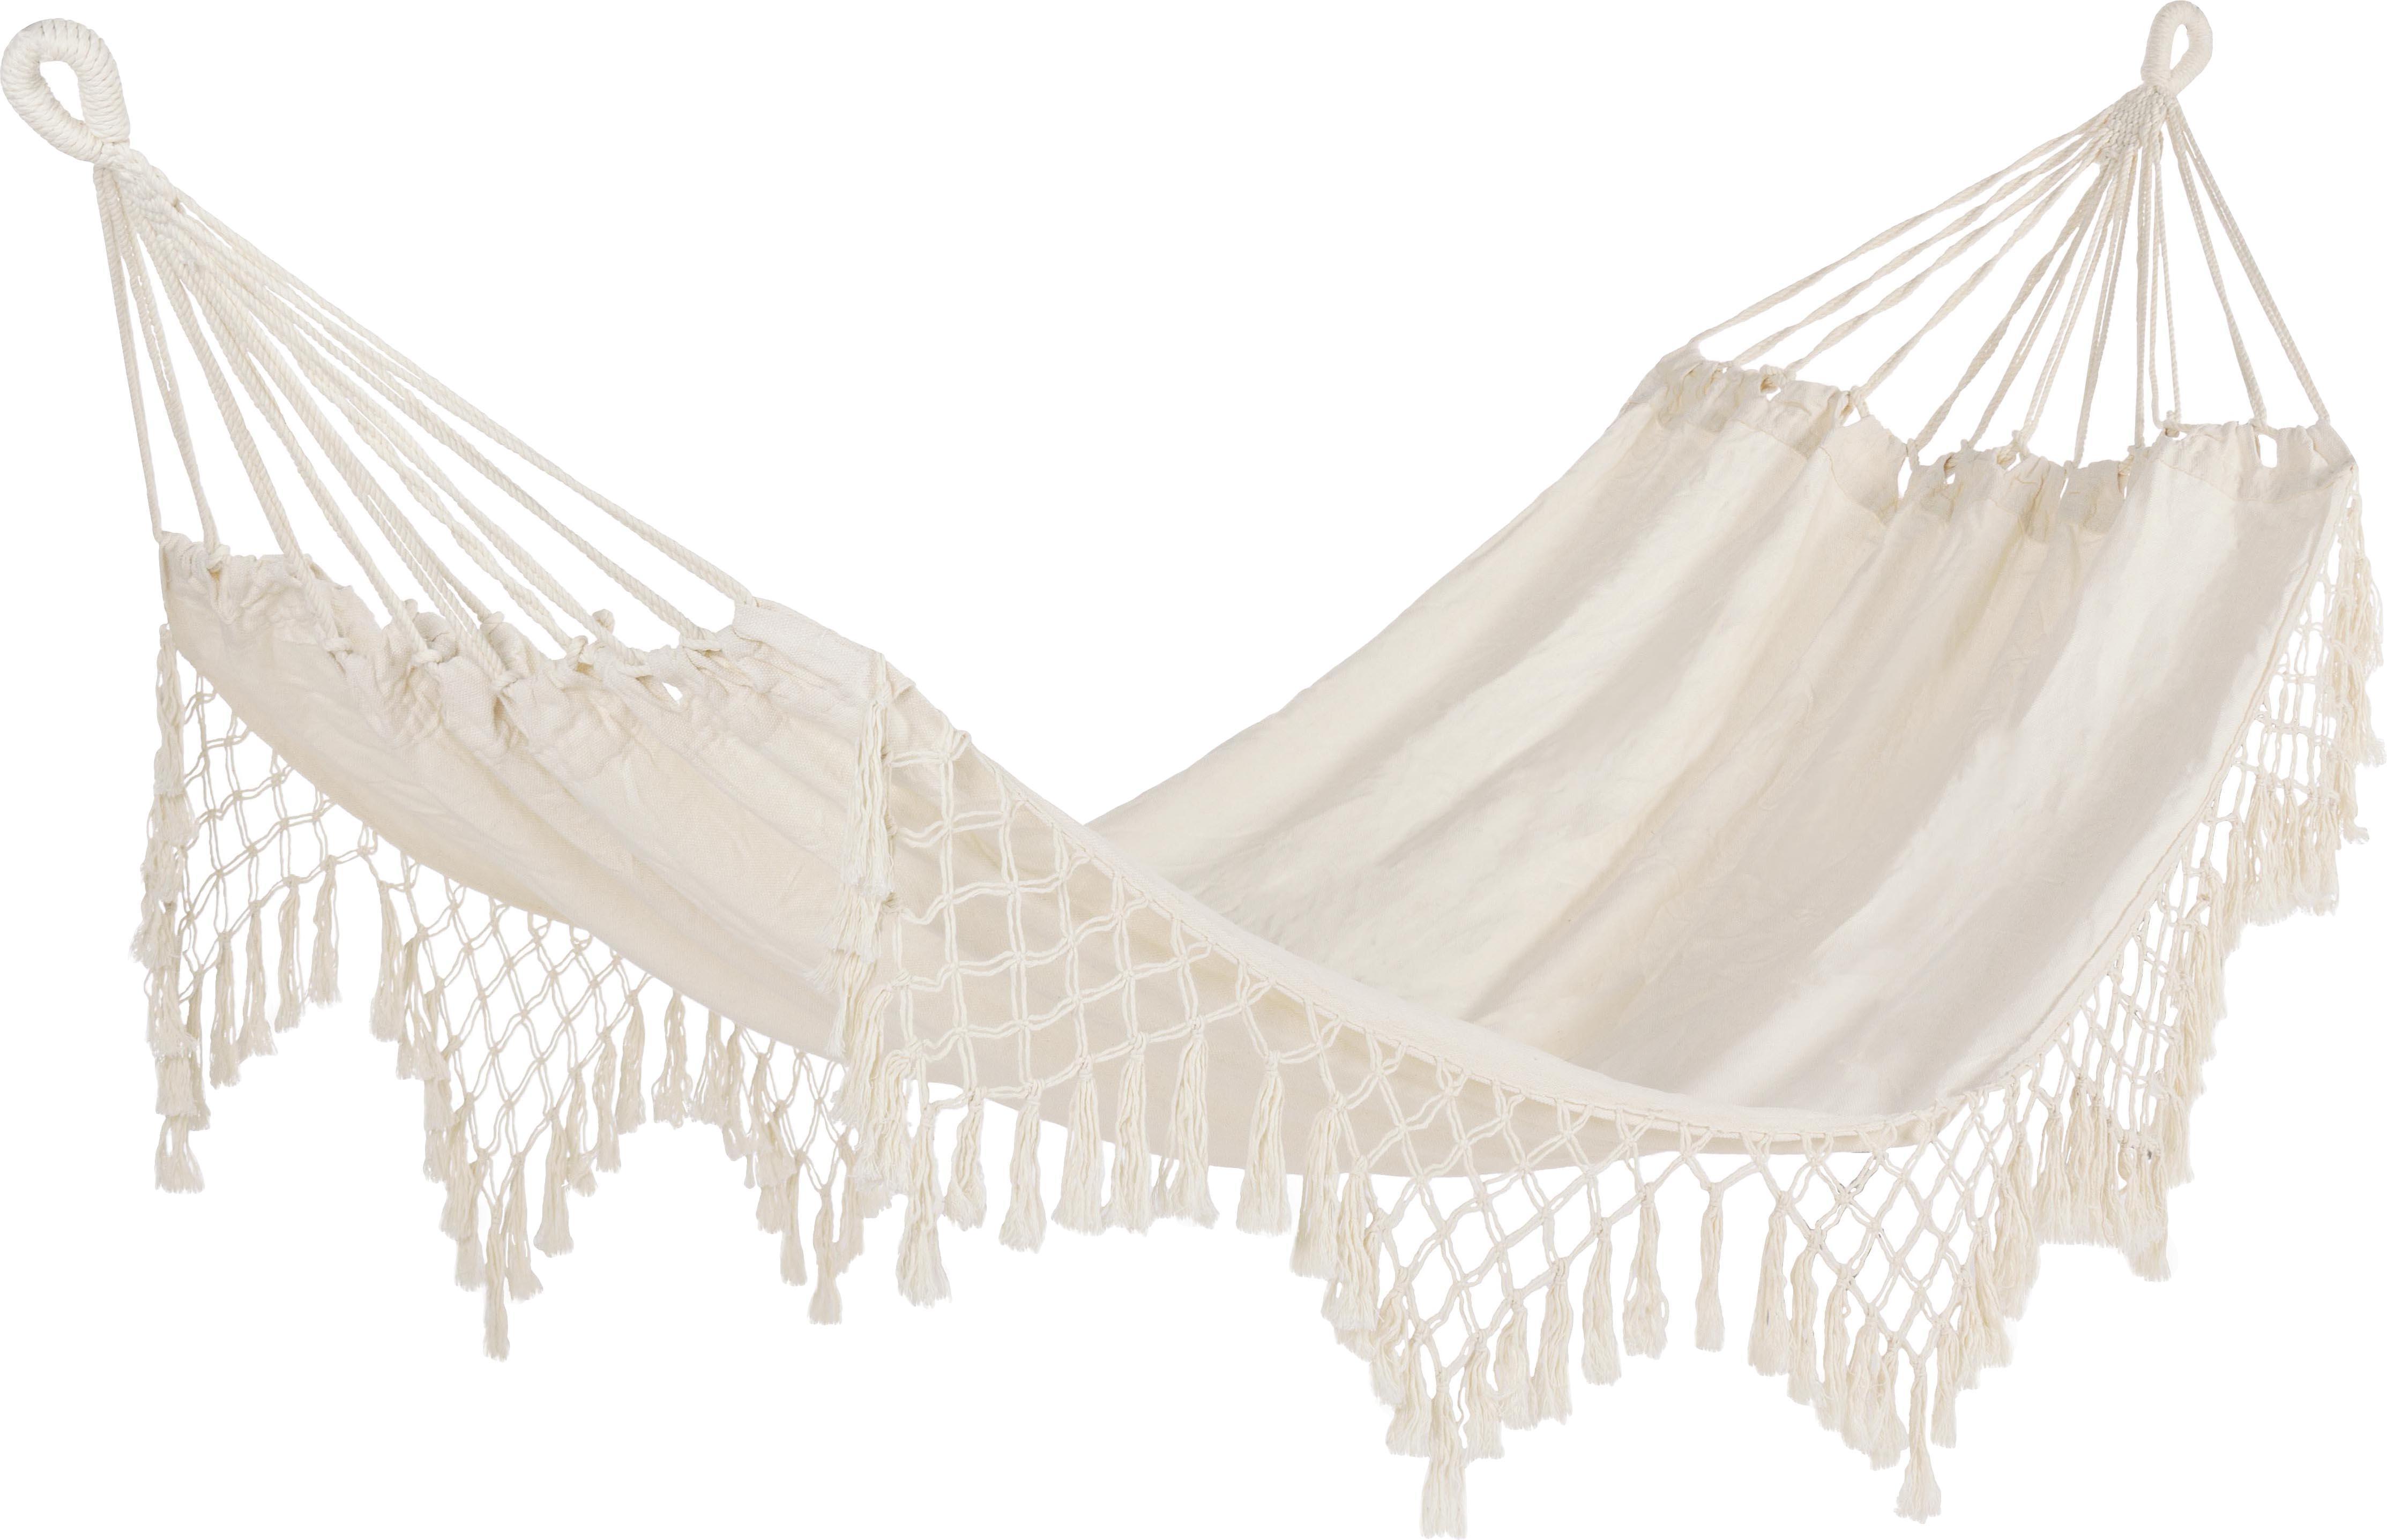 Hangmat Kauana, 65% katoen, 35% polyester, Crèmekleurig, 100 x 200 cm